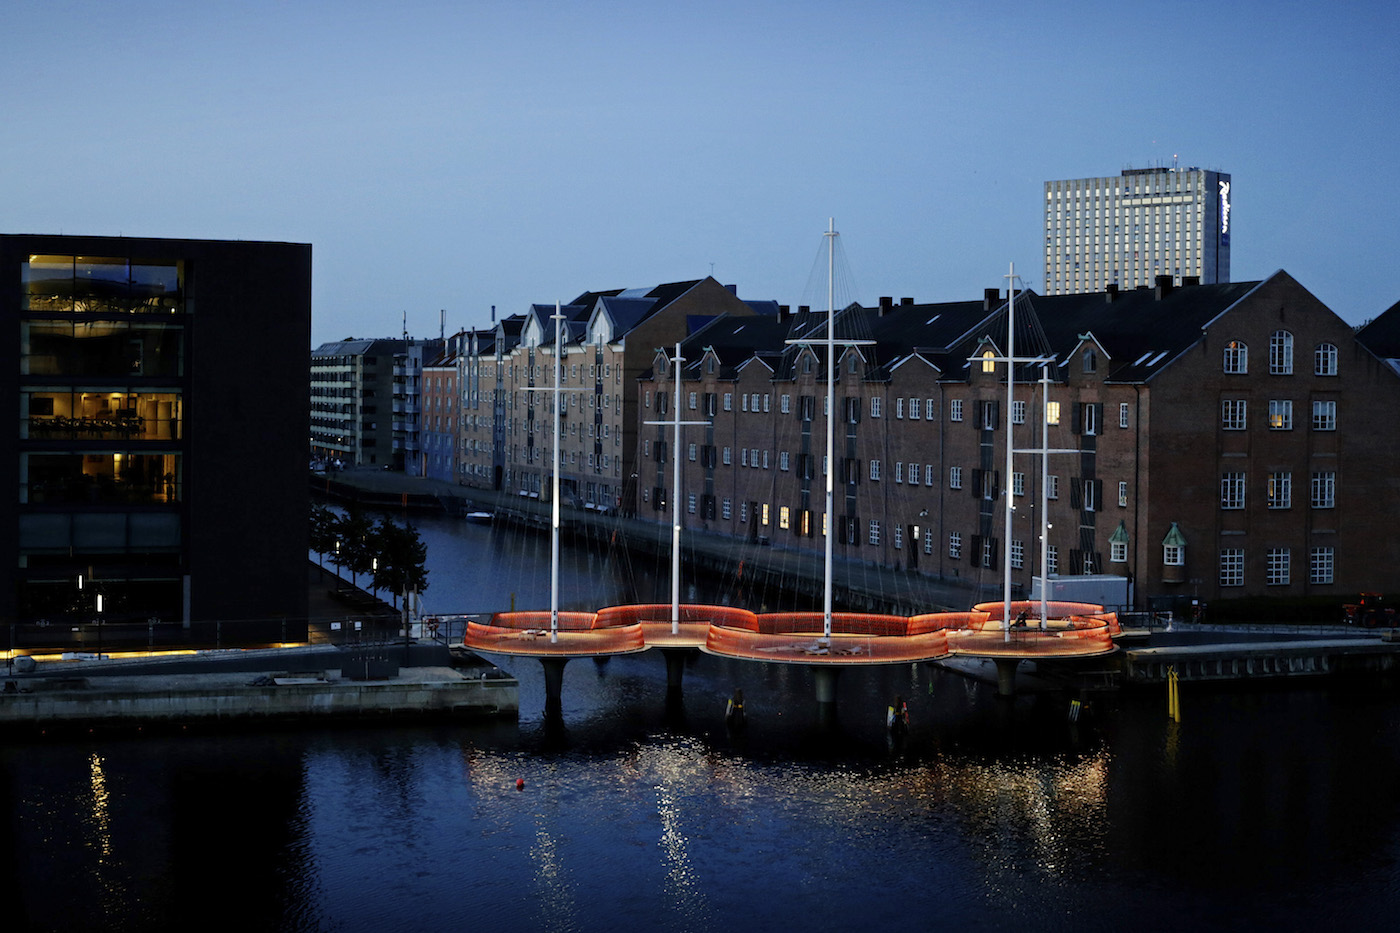 Cirkelbroen - Copenhagen (Olafur Eliasson)